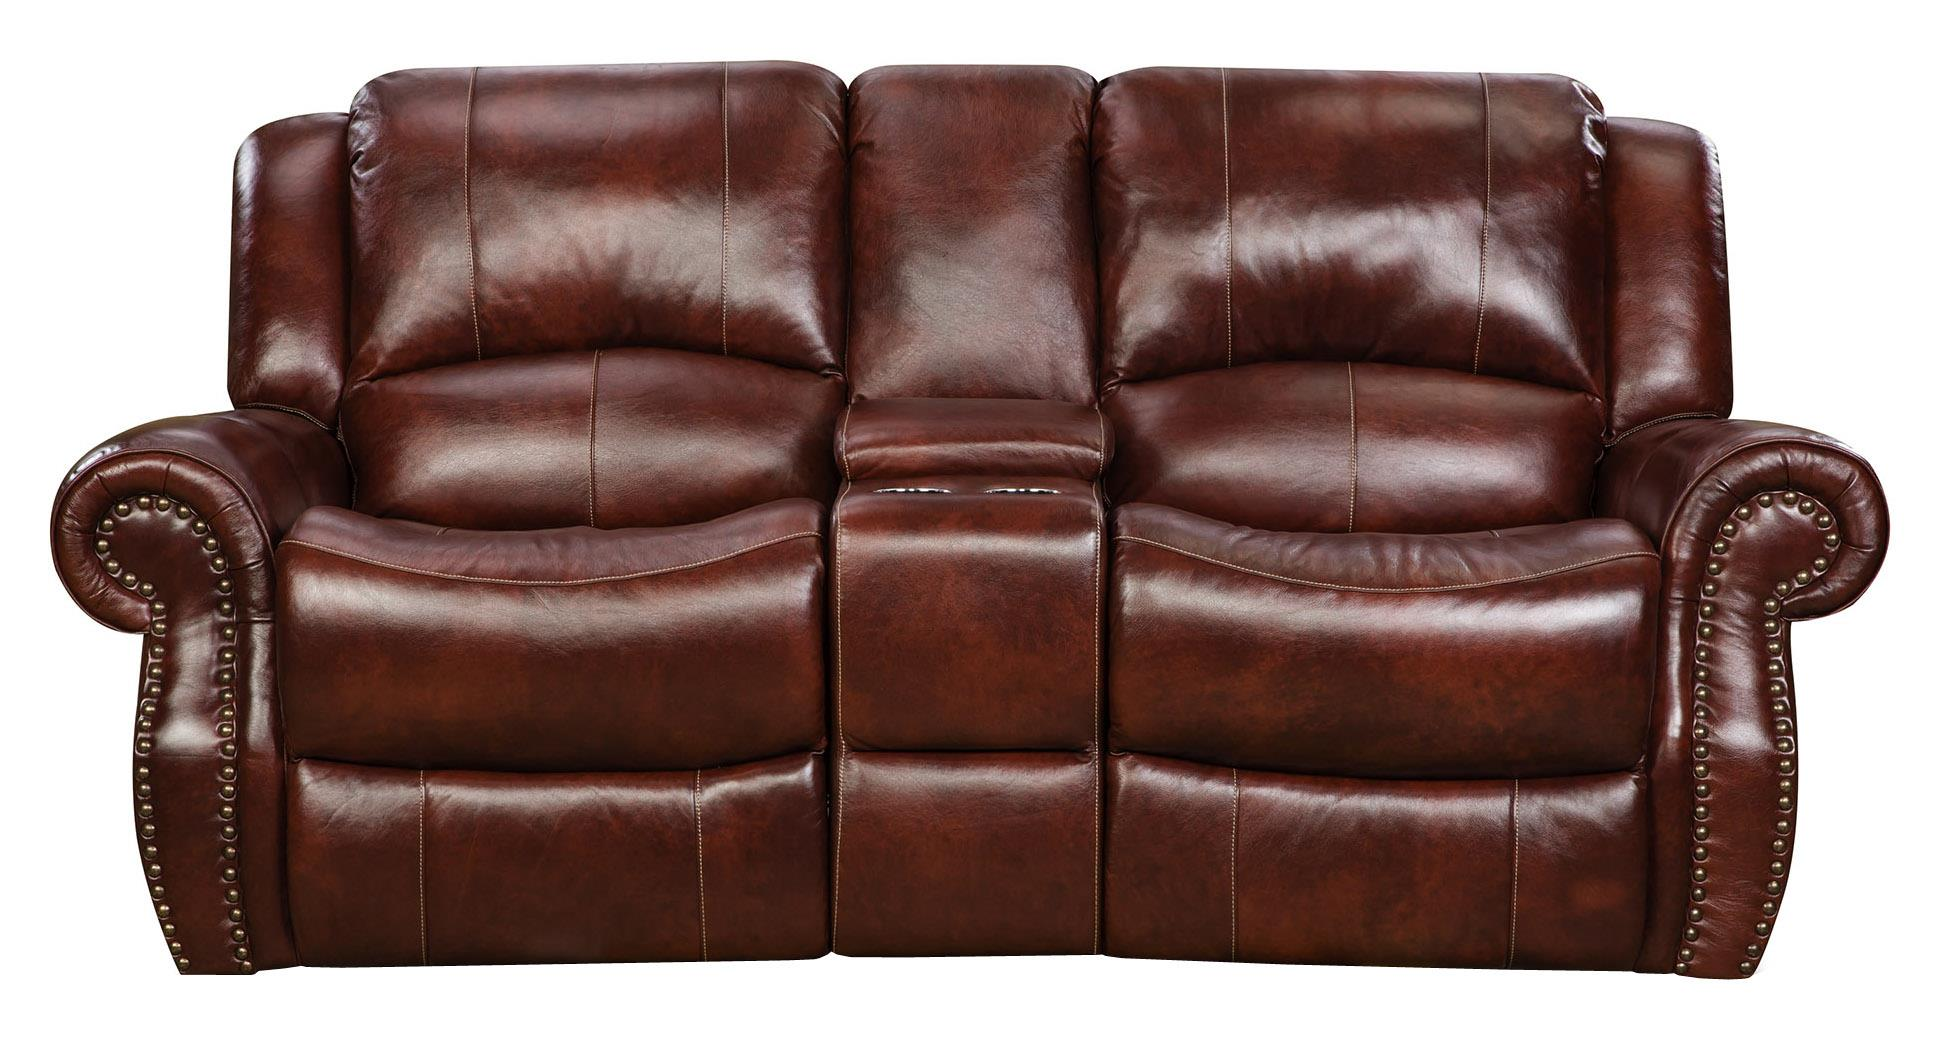 corinthian leather sofa sleepers queen size alexander 99901 40 reclining